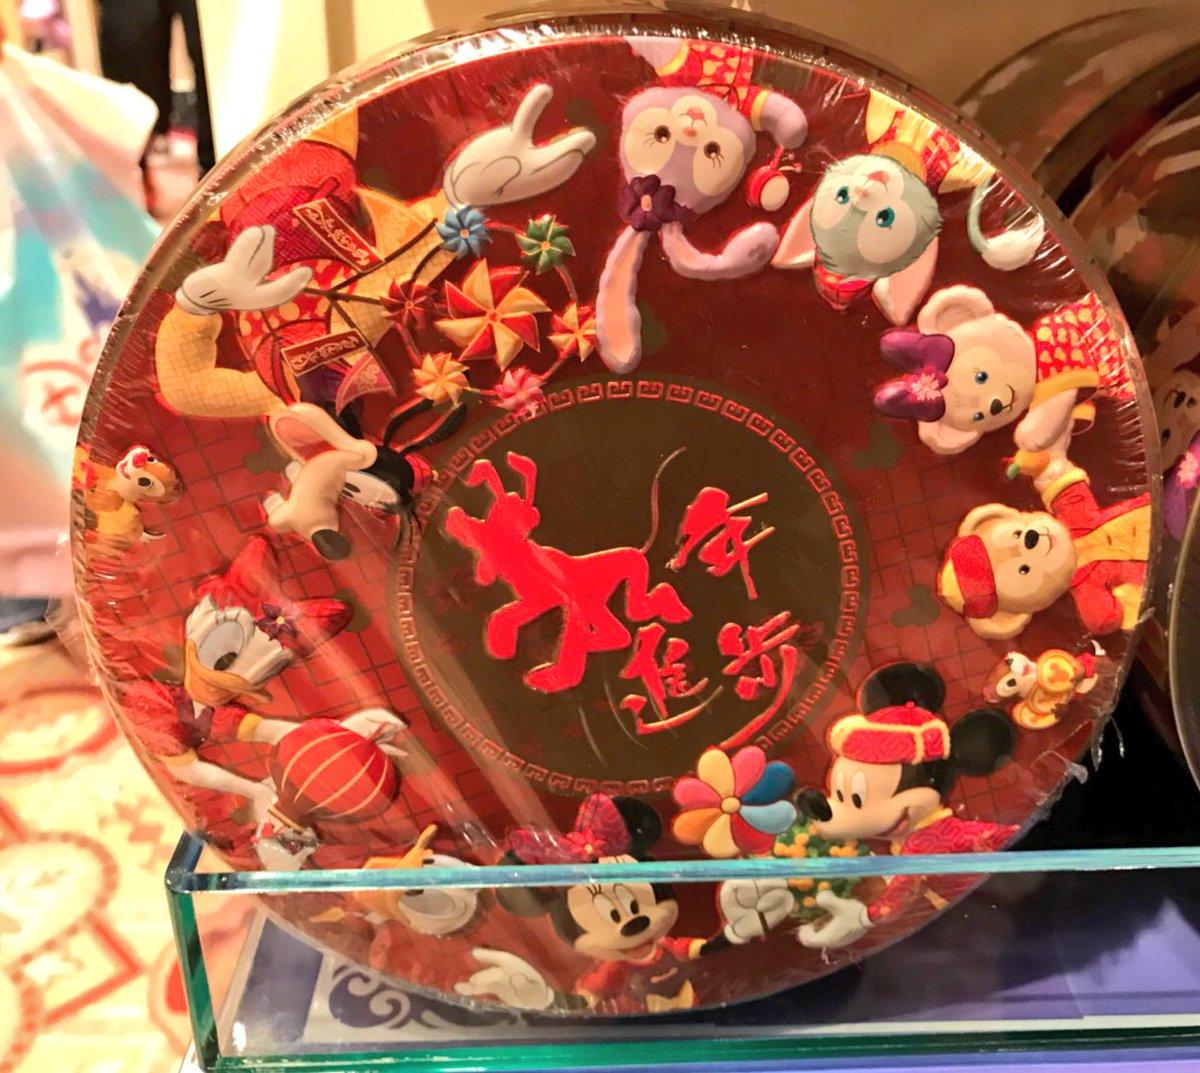 HKDL 旧正月グッズ🎍✨ ステラルーのコスチューム付き、SSサイズぬいぐるみ♡ お菓子の缶も可愛い♡  #HKDL #HongKongDisneyland